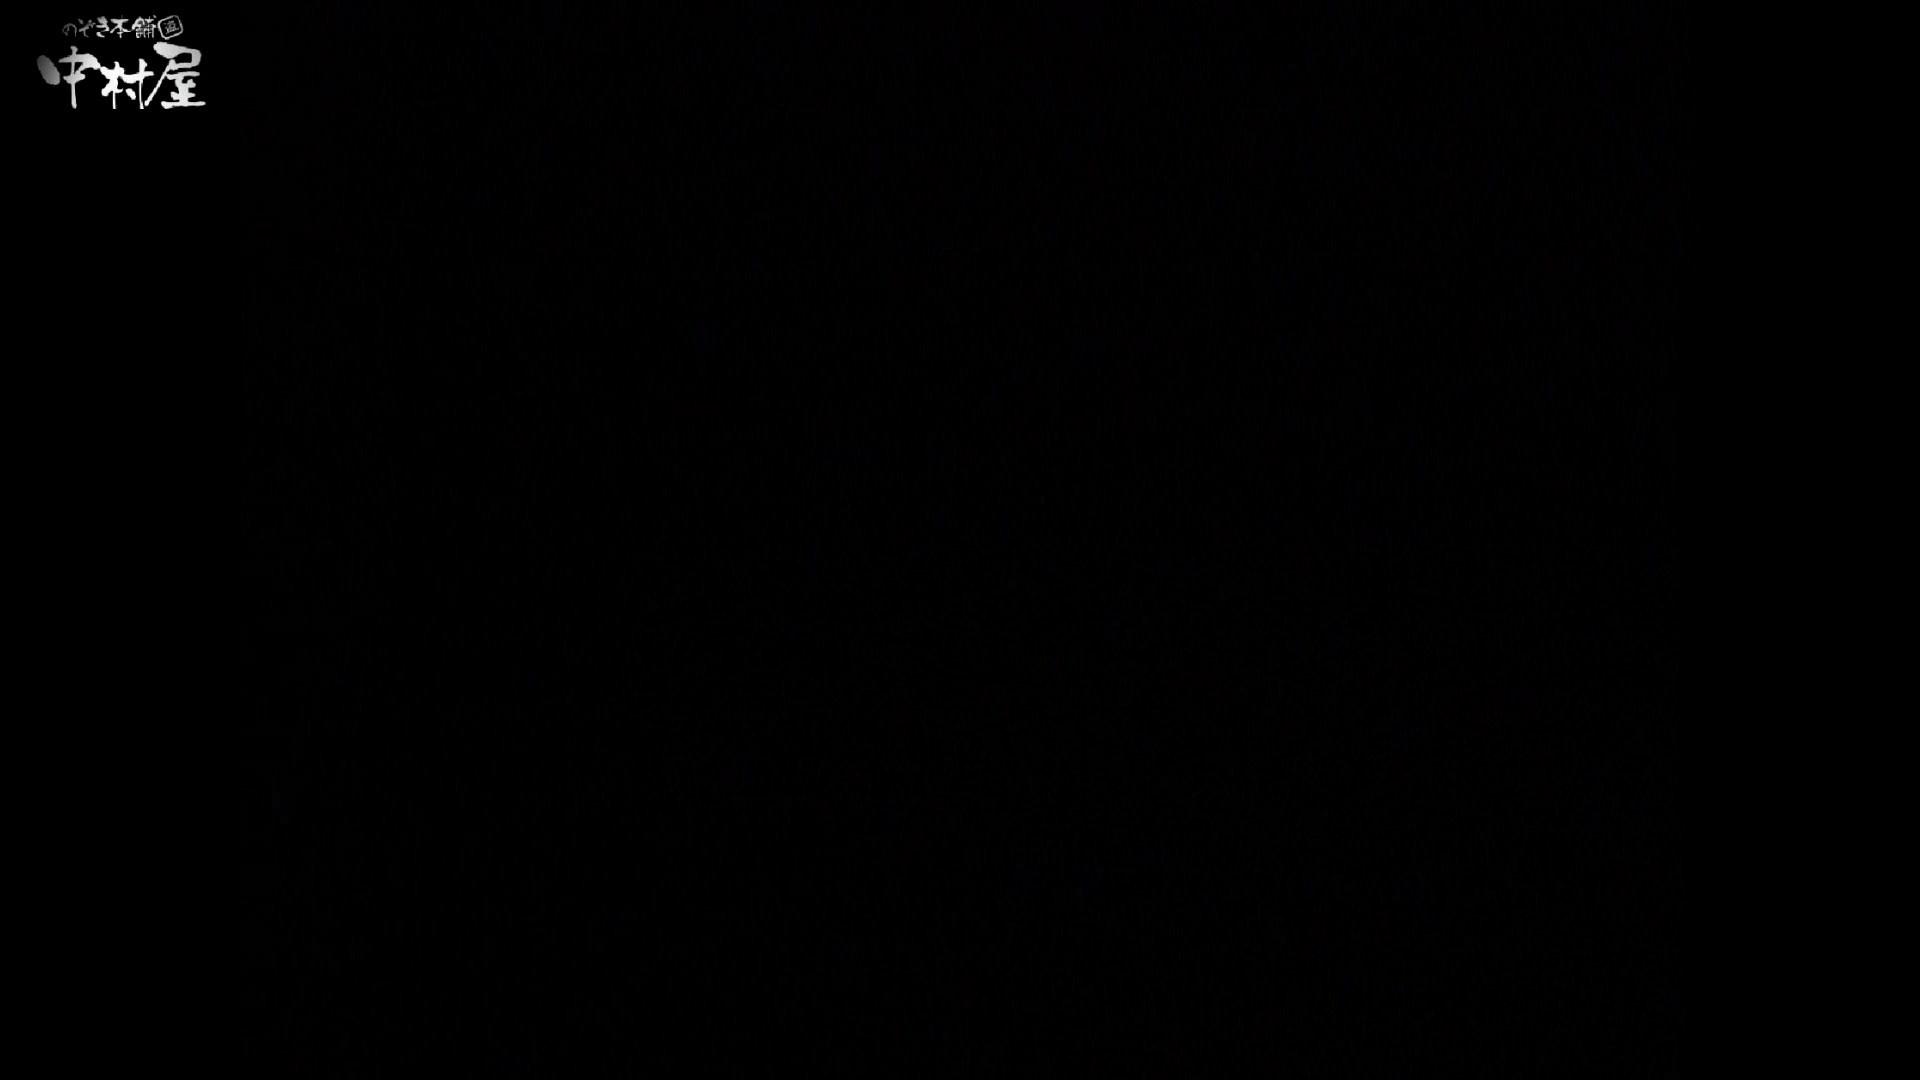 民家風呂専門盗撮師の超危険映像 vol.016 民家 盗み撮り動画 69連発 27